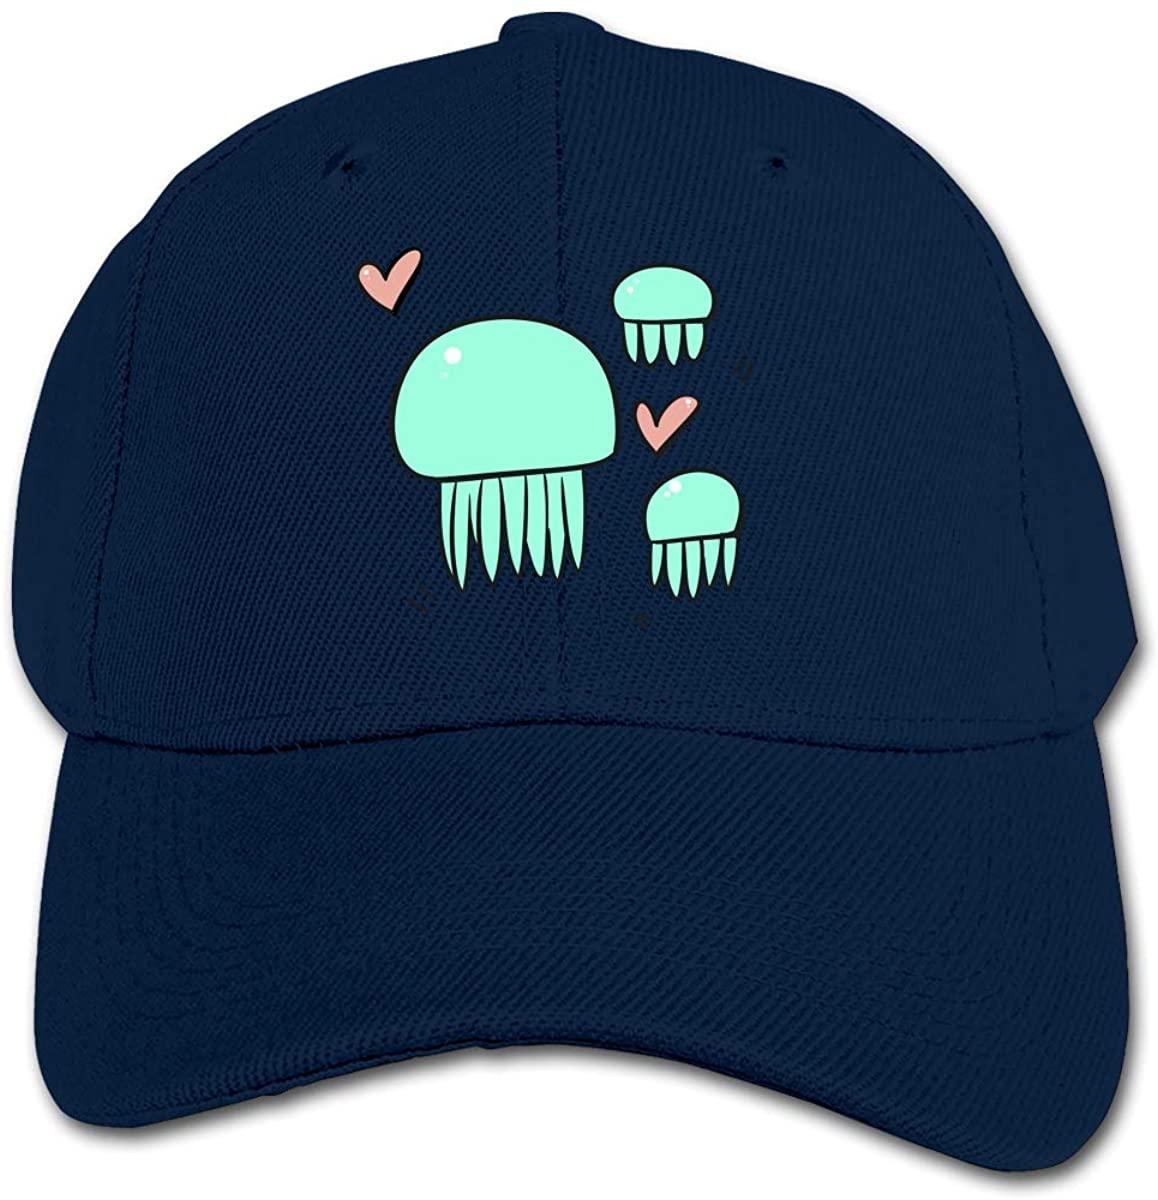 Jellyfish Kid's Daily Sun Protection,Casual, Baseball Cap, Adjustable Cartoon Hat Cap